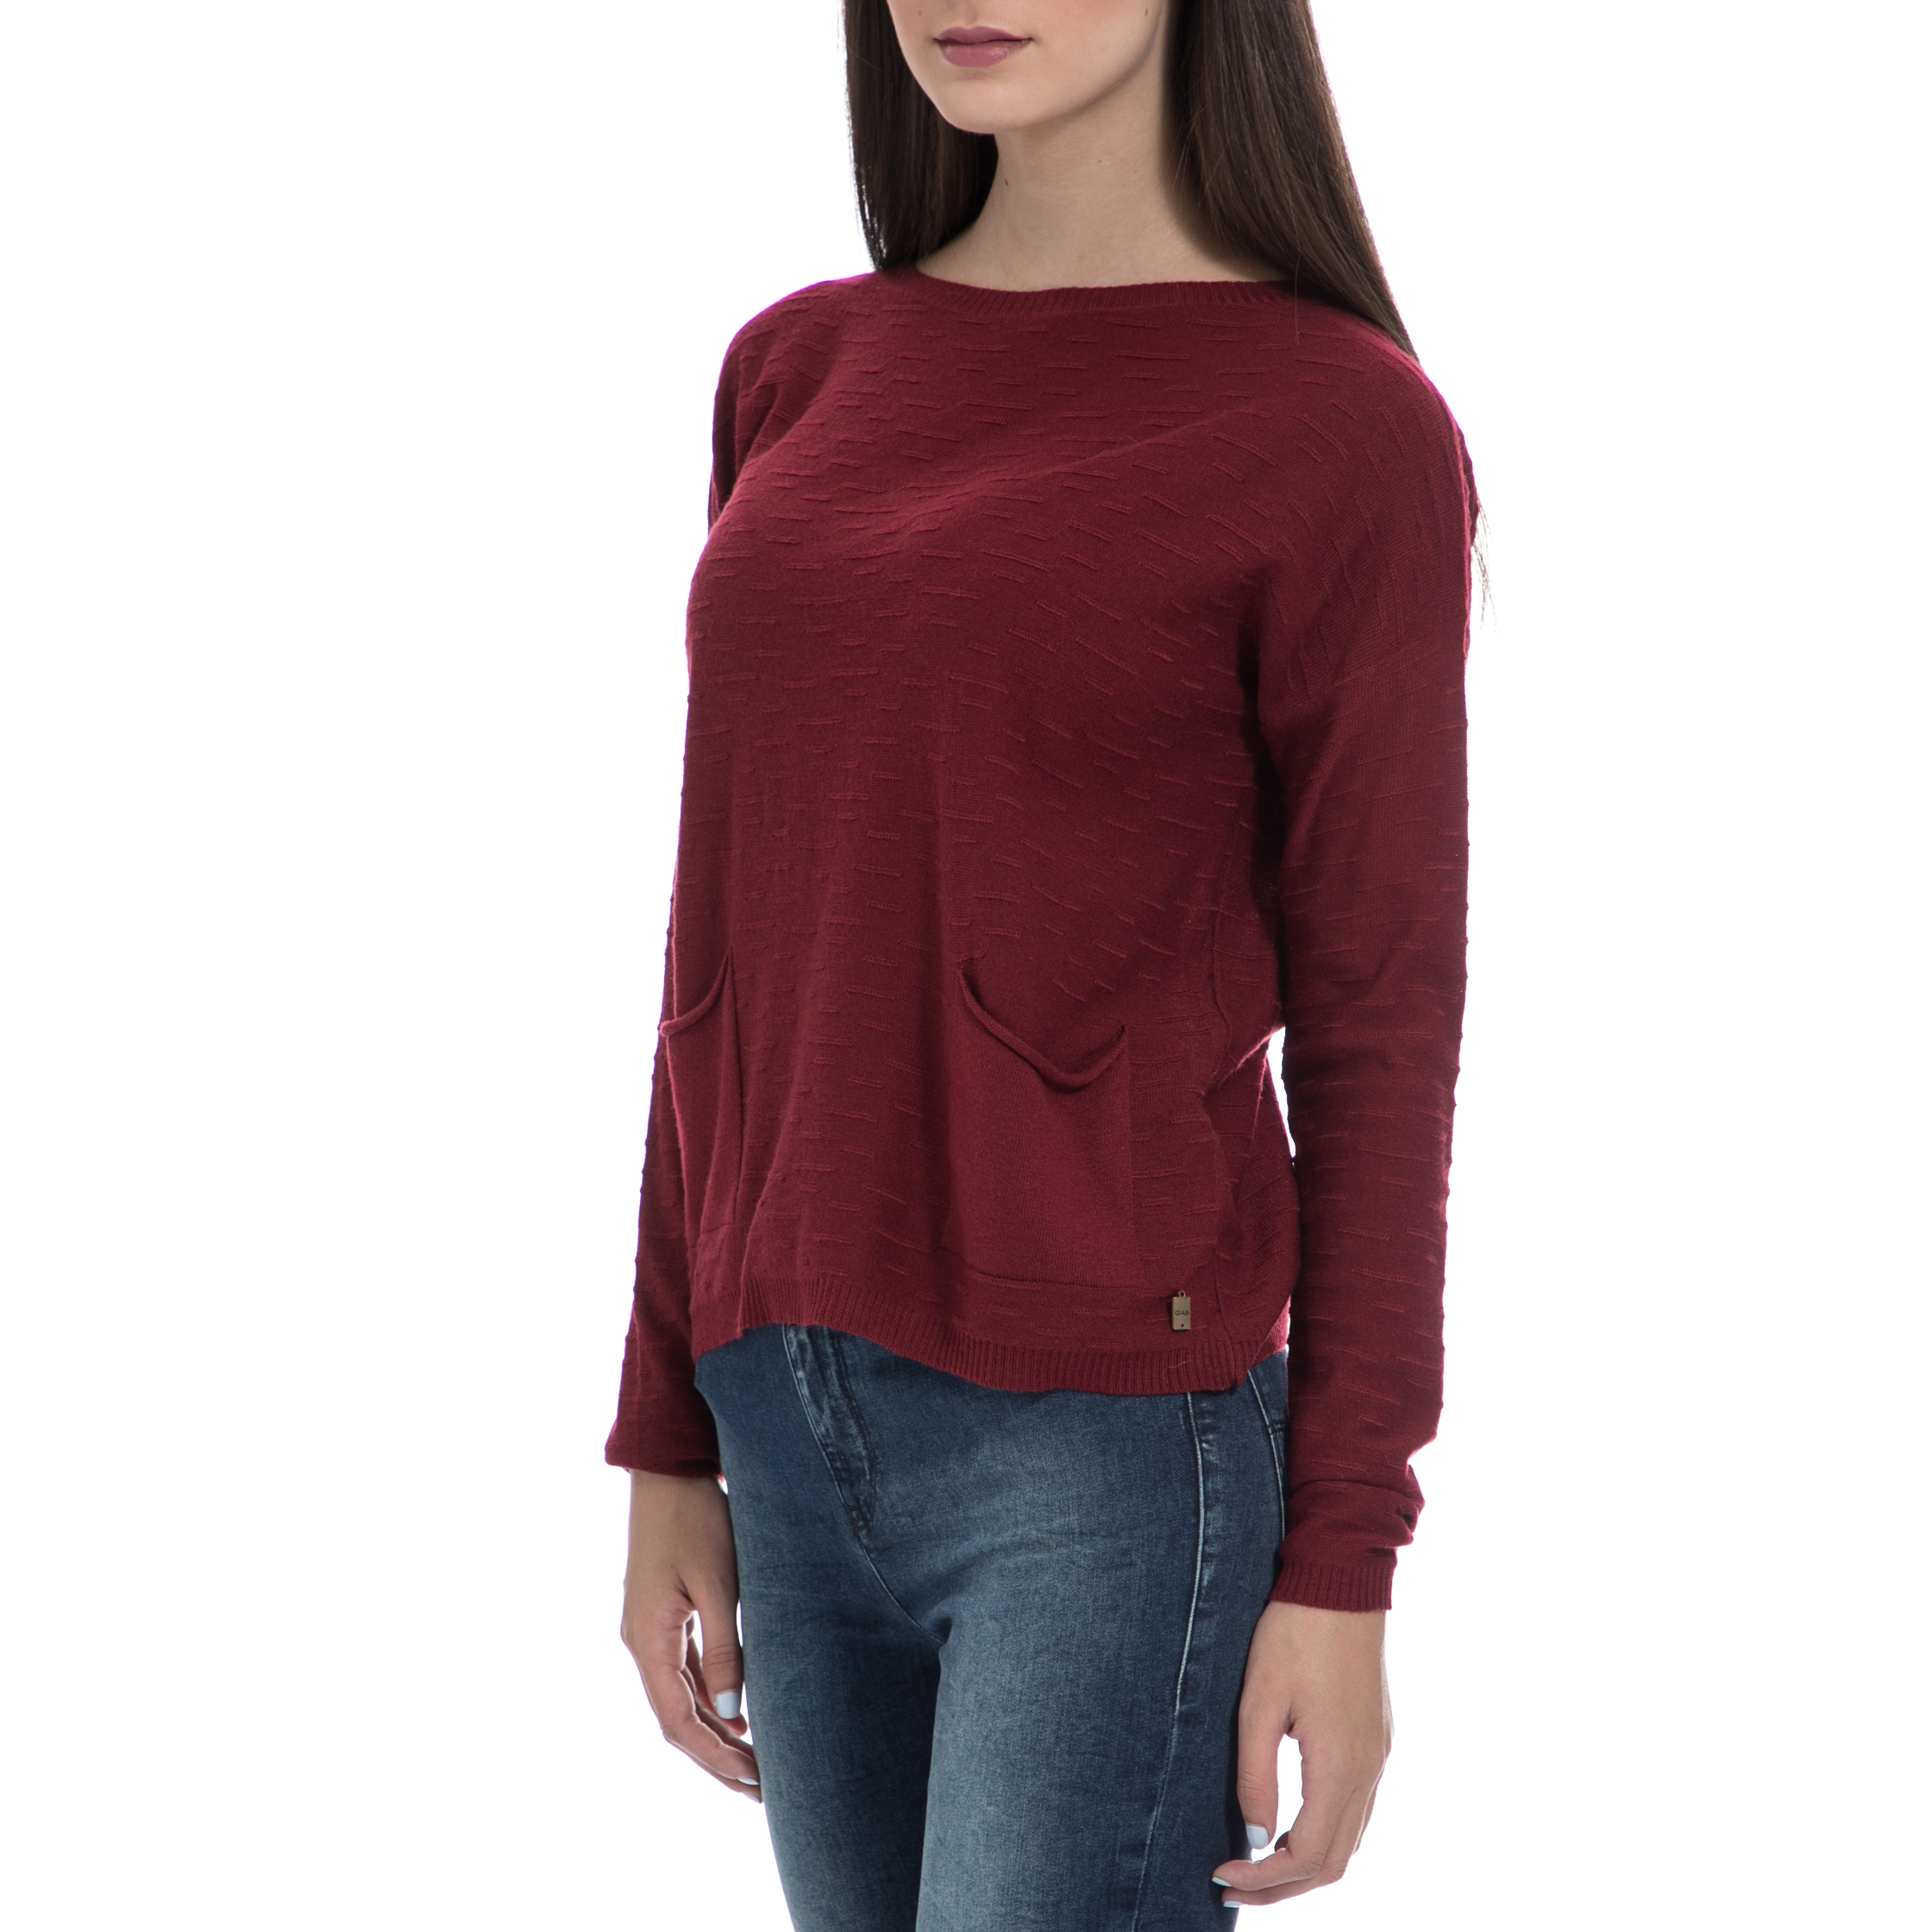 d4fa82a683c1 GAS - Γυναικεία μπλούζα GAS μπορντό